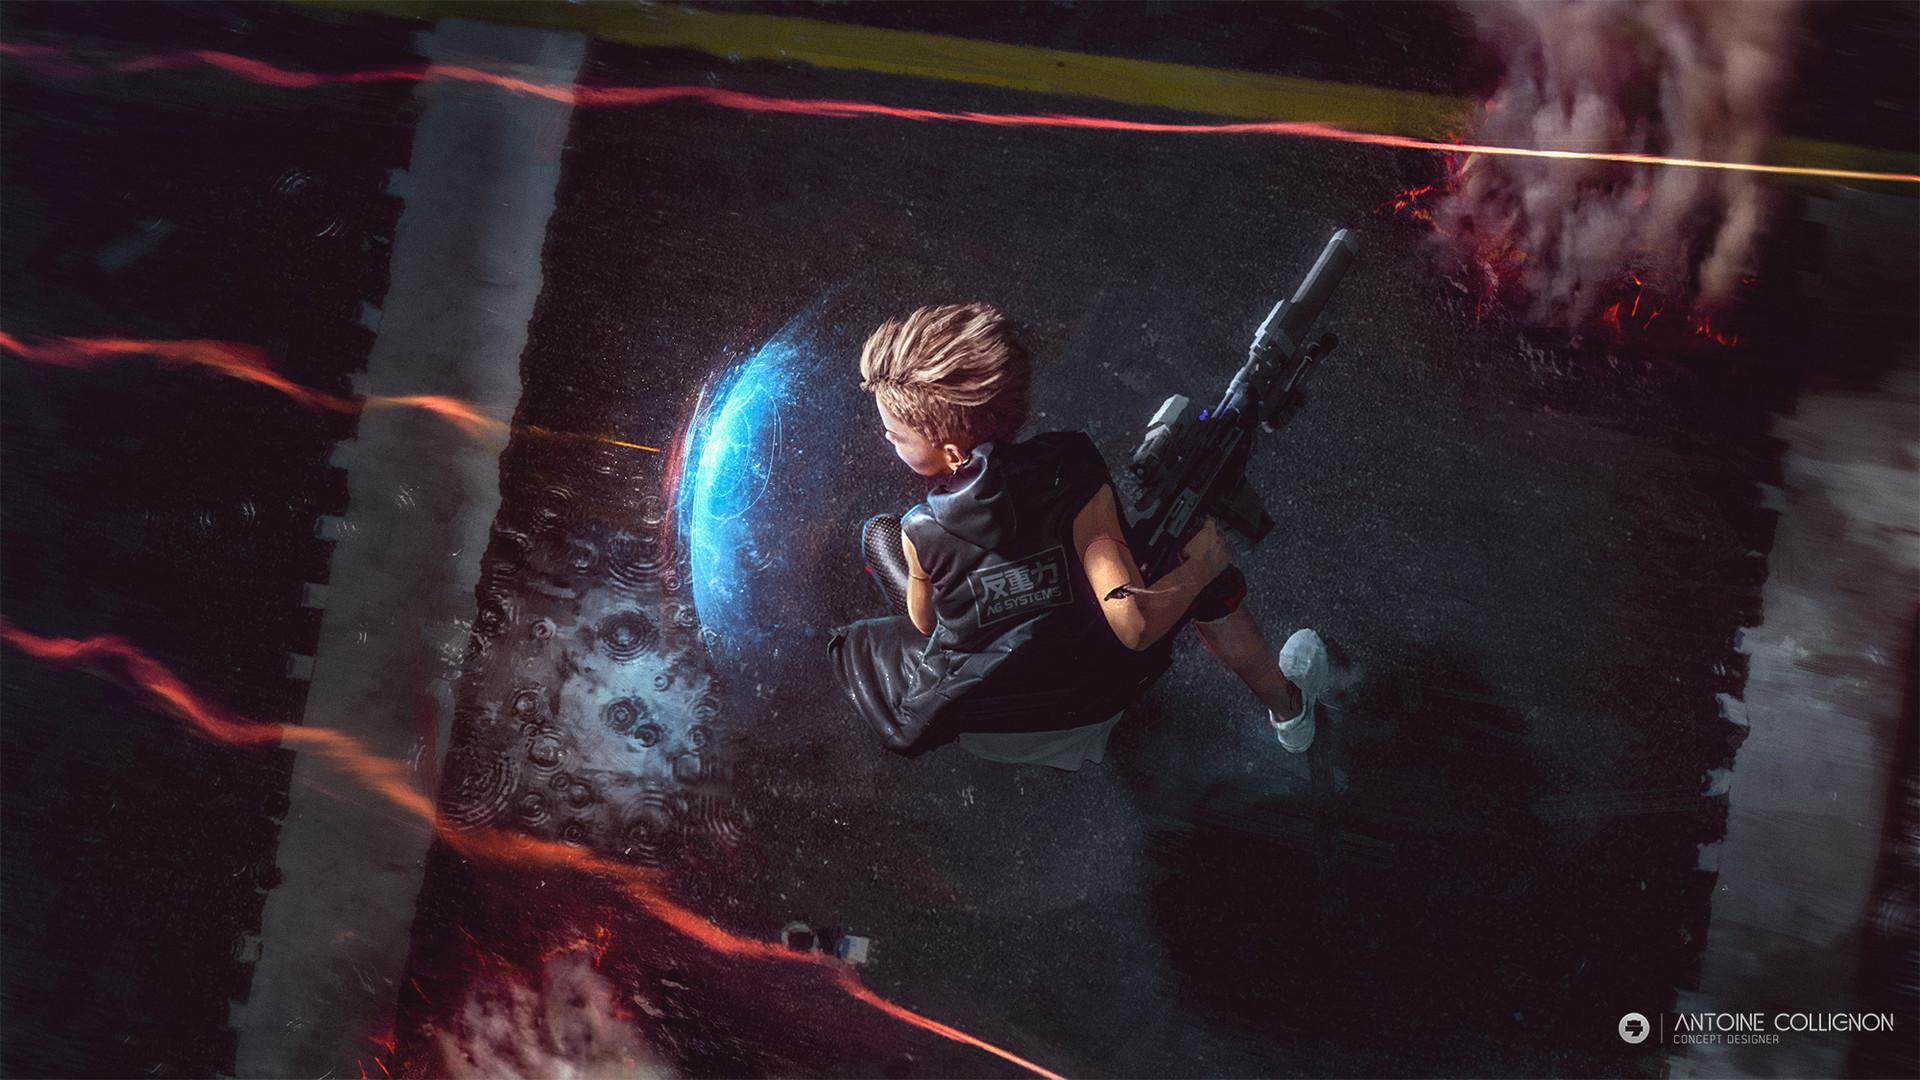 Teen cyborg (thug) - fight